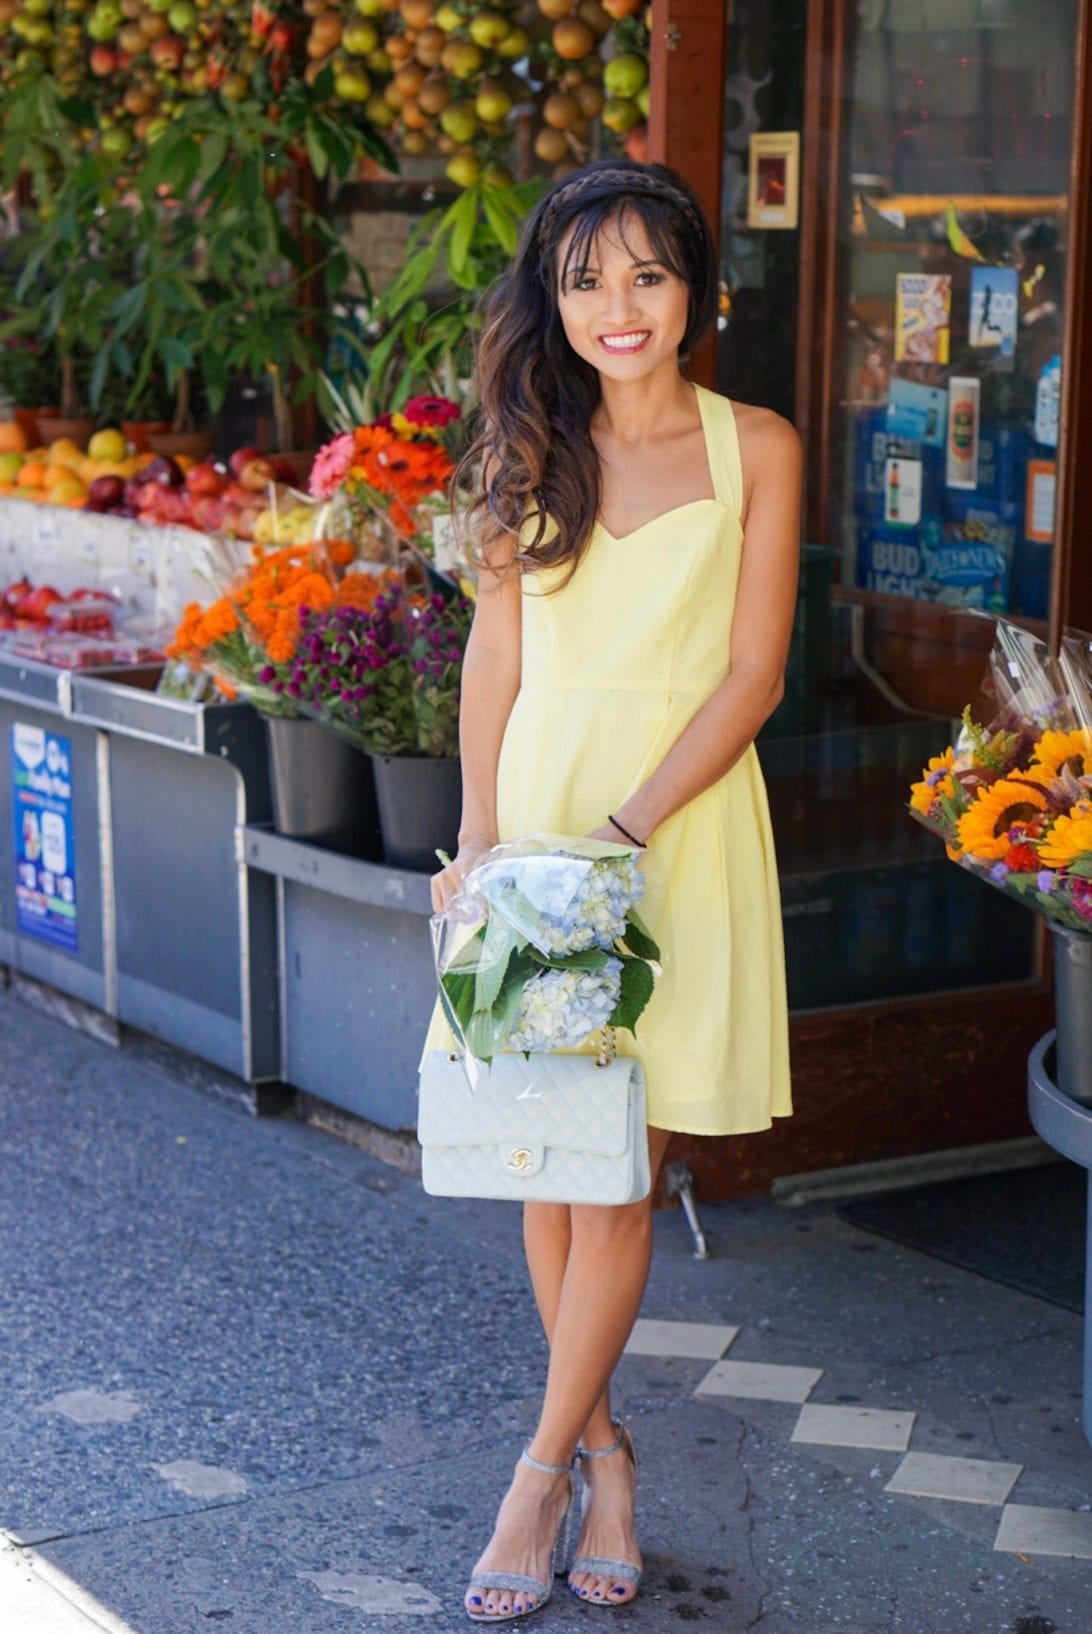 yellow dress, yellow seersucker dress, seersucker dress, Chanel bag, flower shop, NYC, NYC flower shop